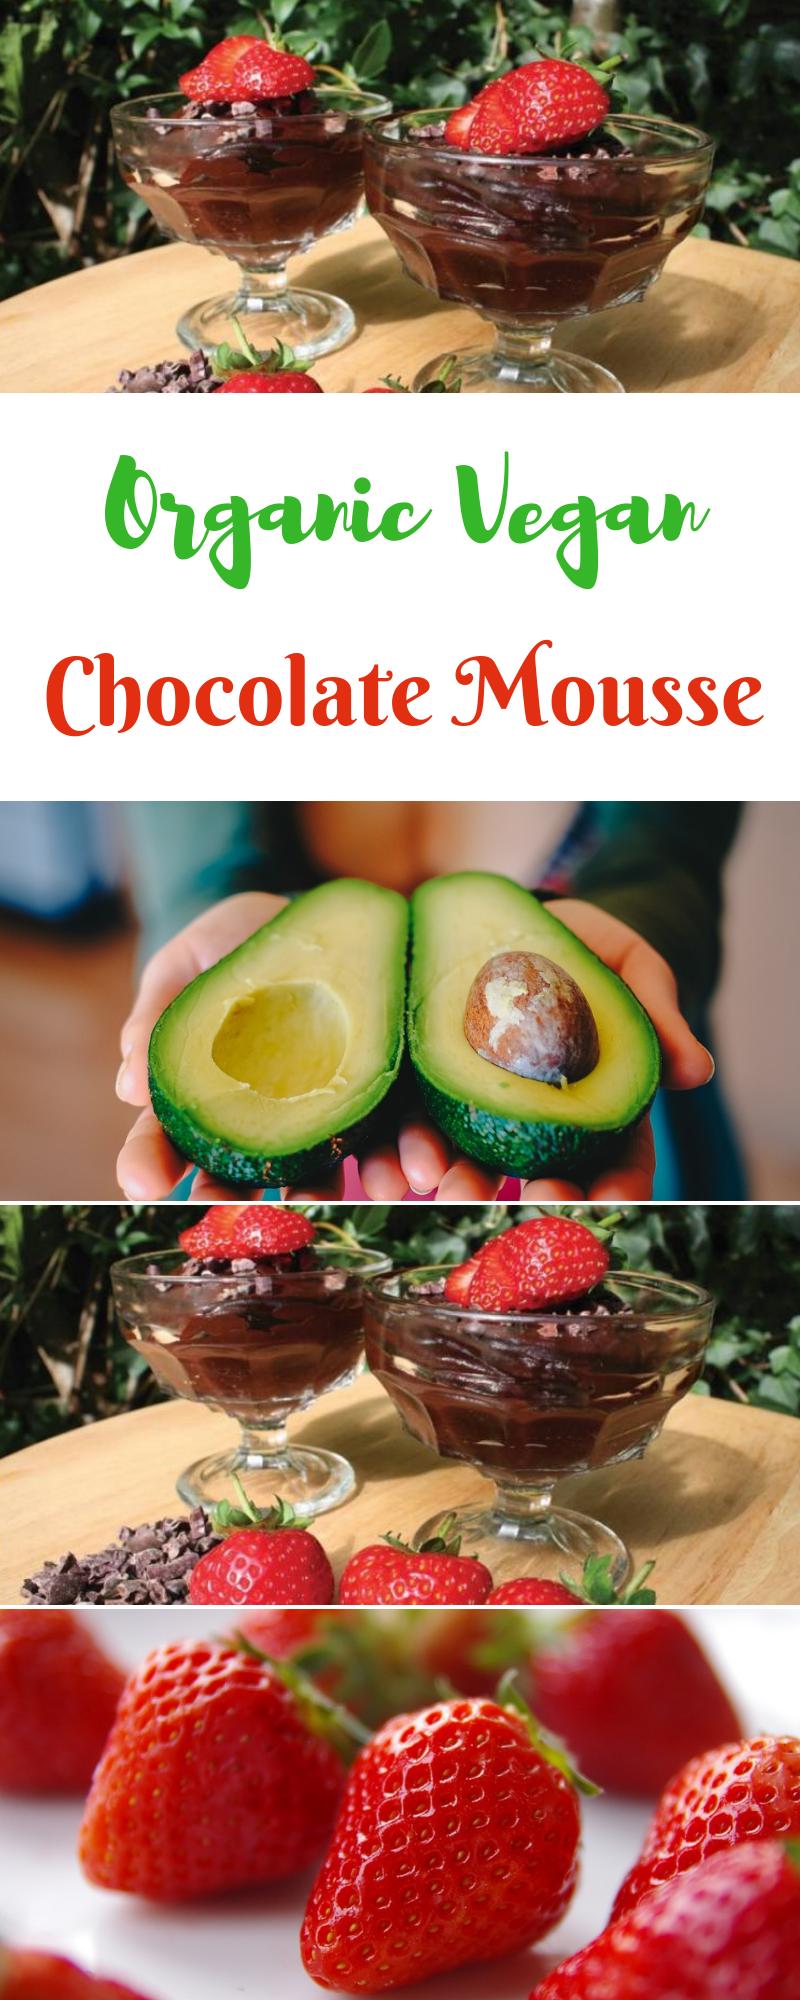 Organic Vegan Chocolate Mousse